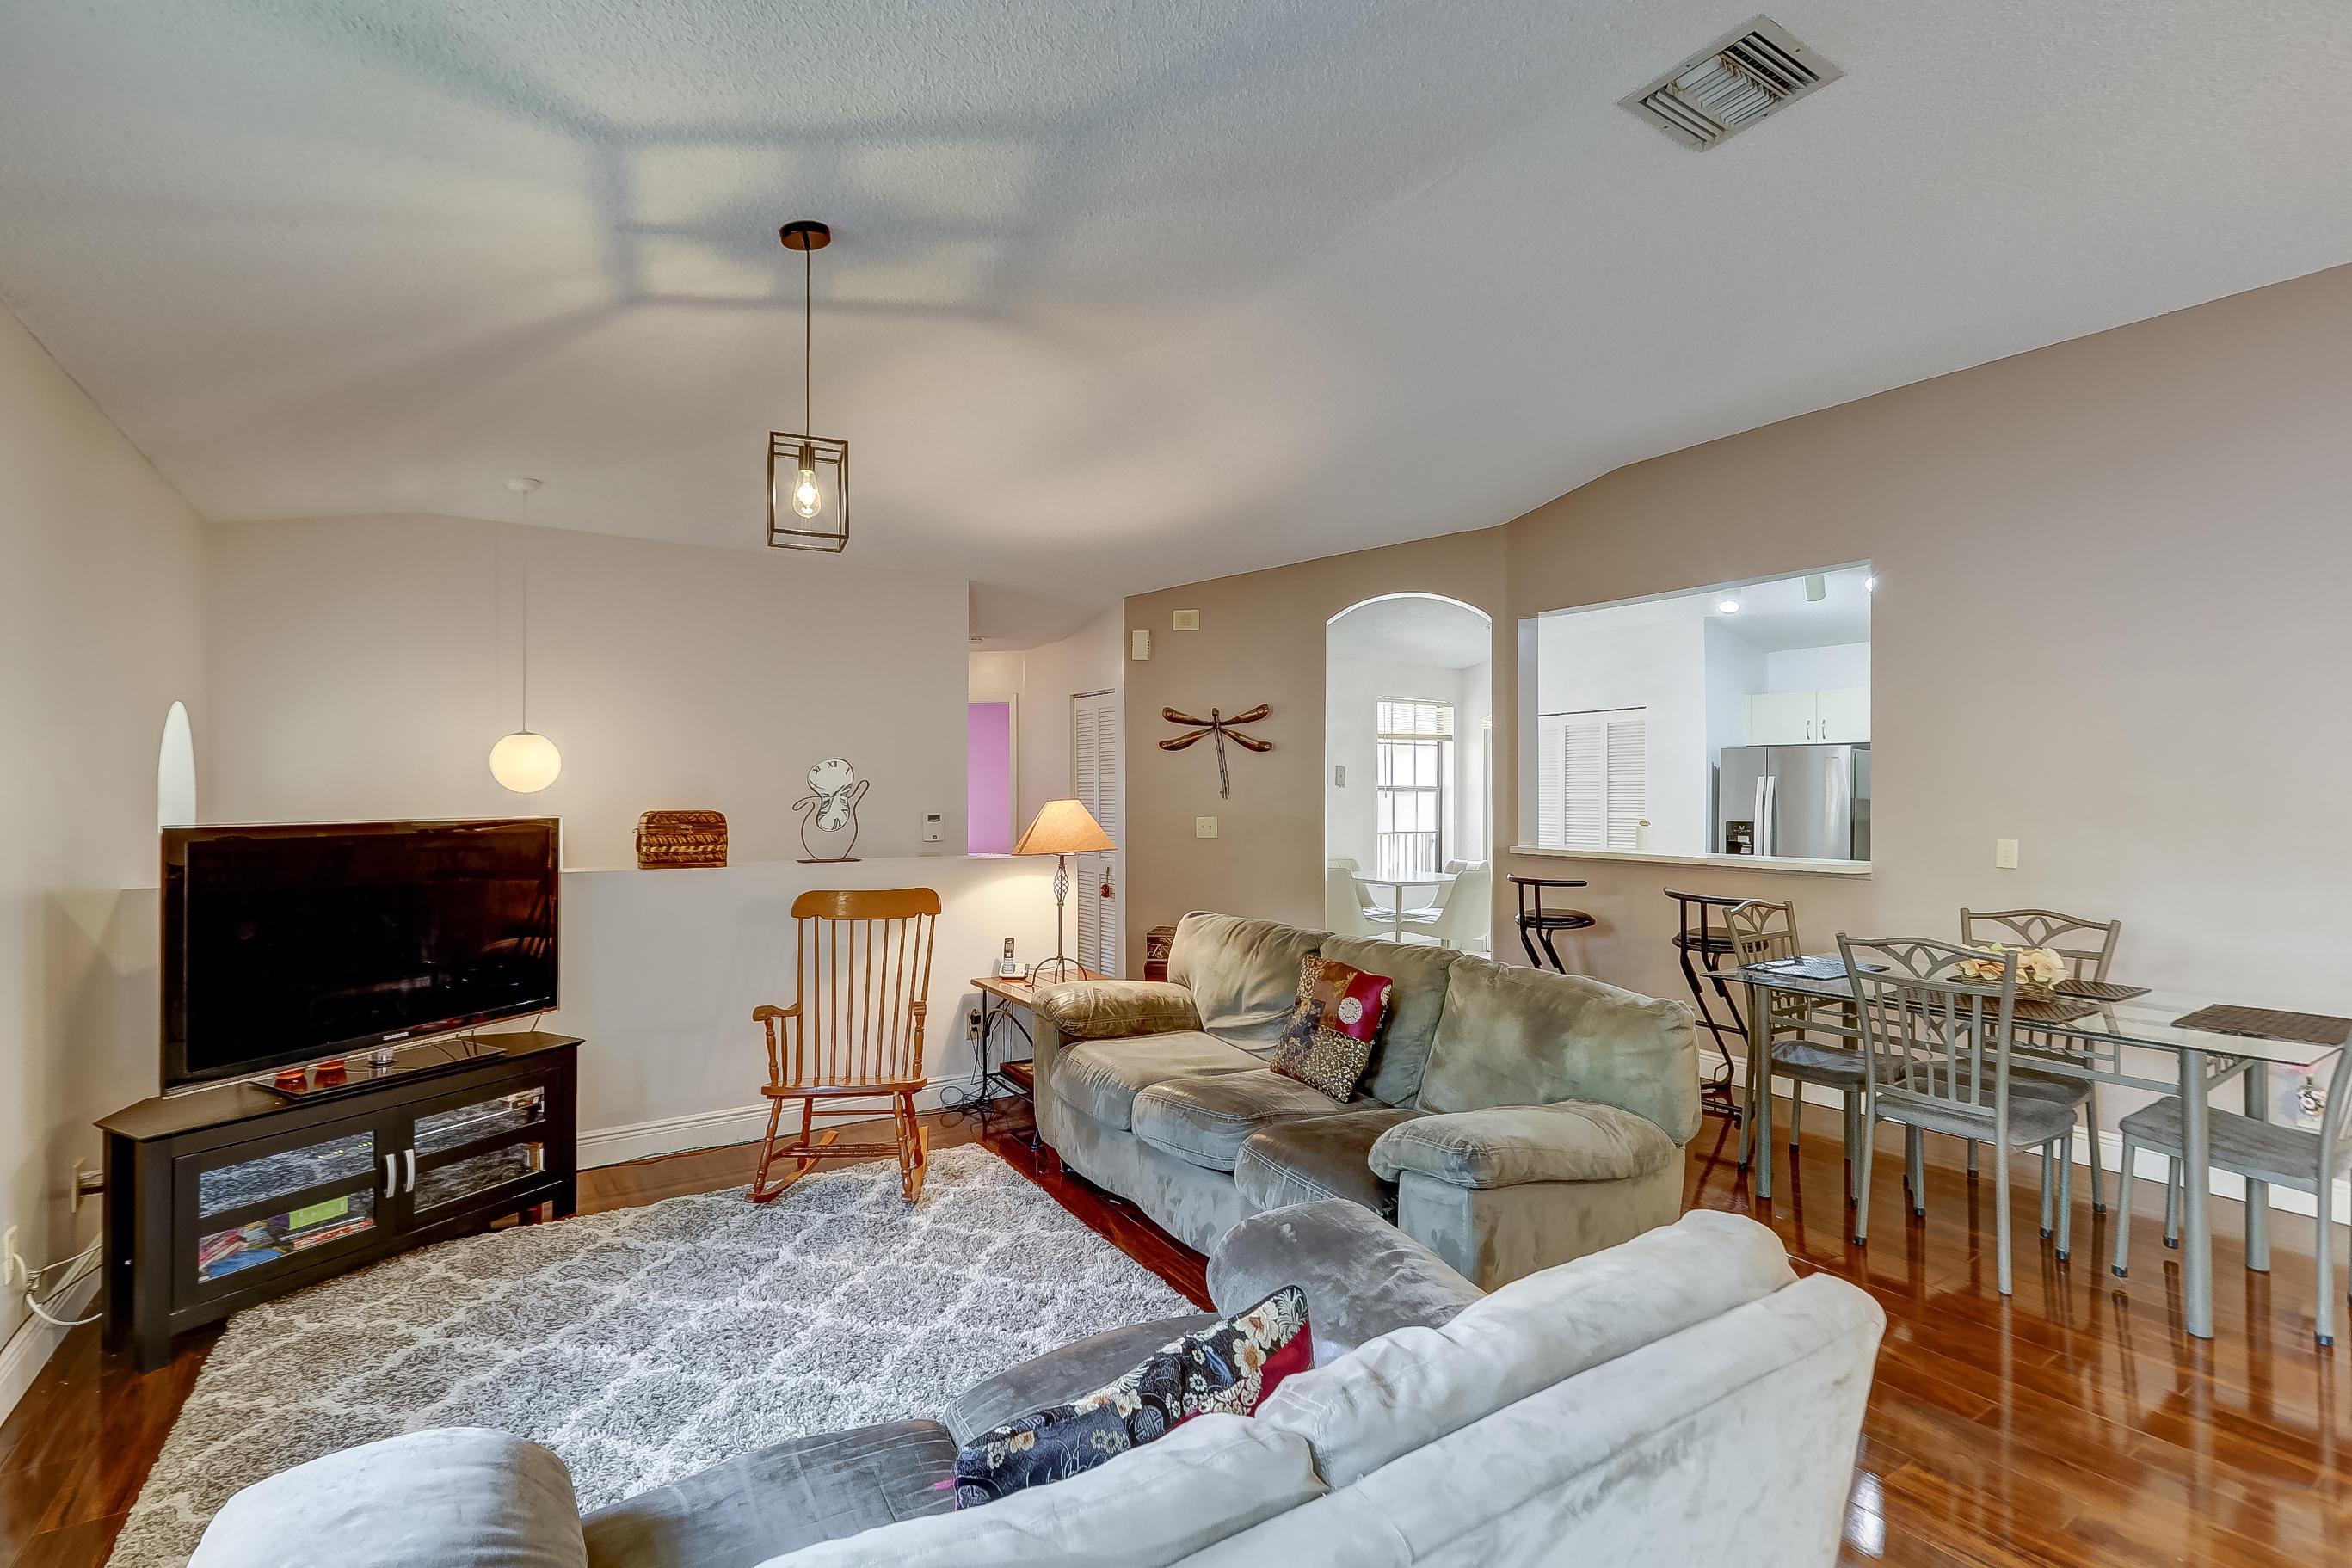 402 SW 158th Terrace 204 Pembroke Pines, FL 33027 photo 1